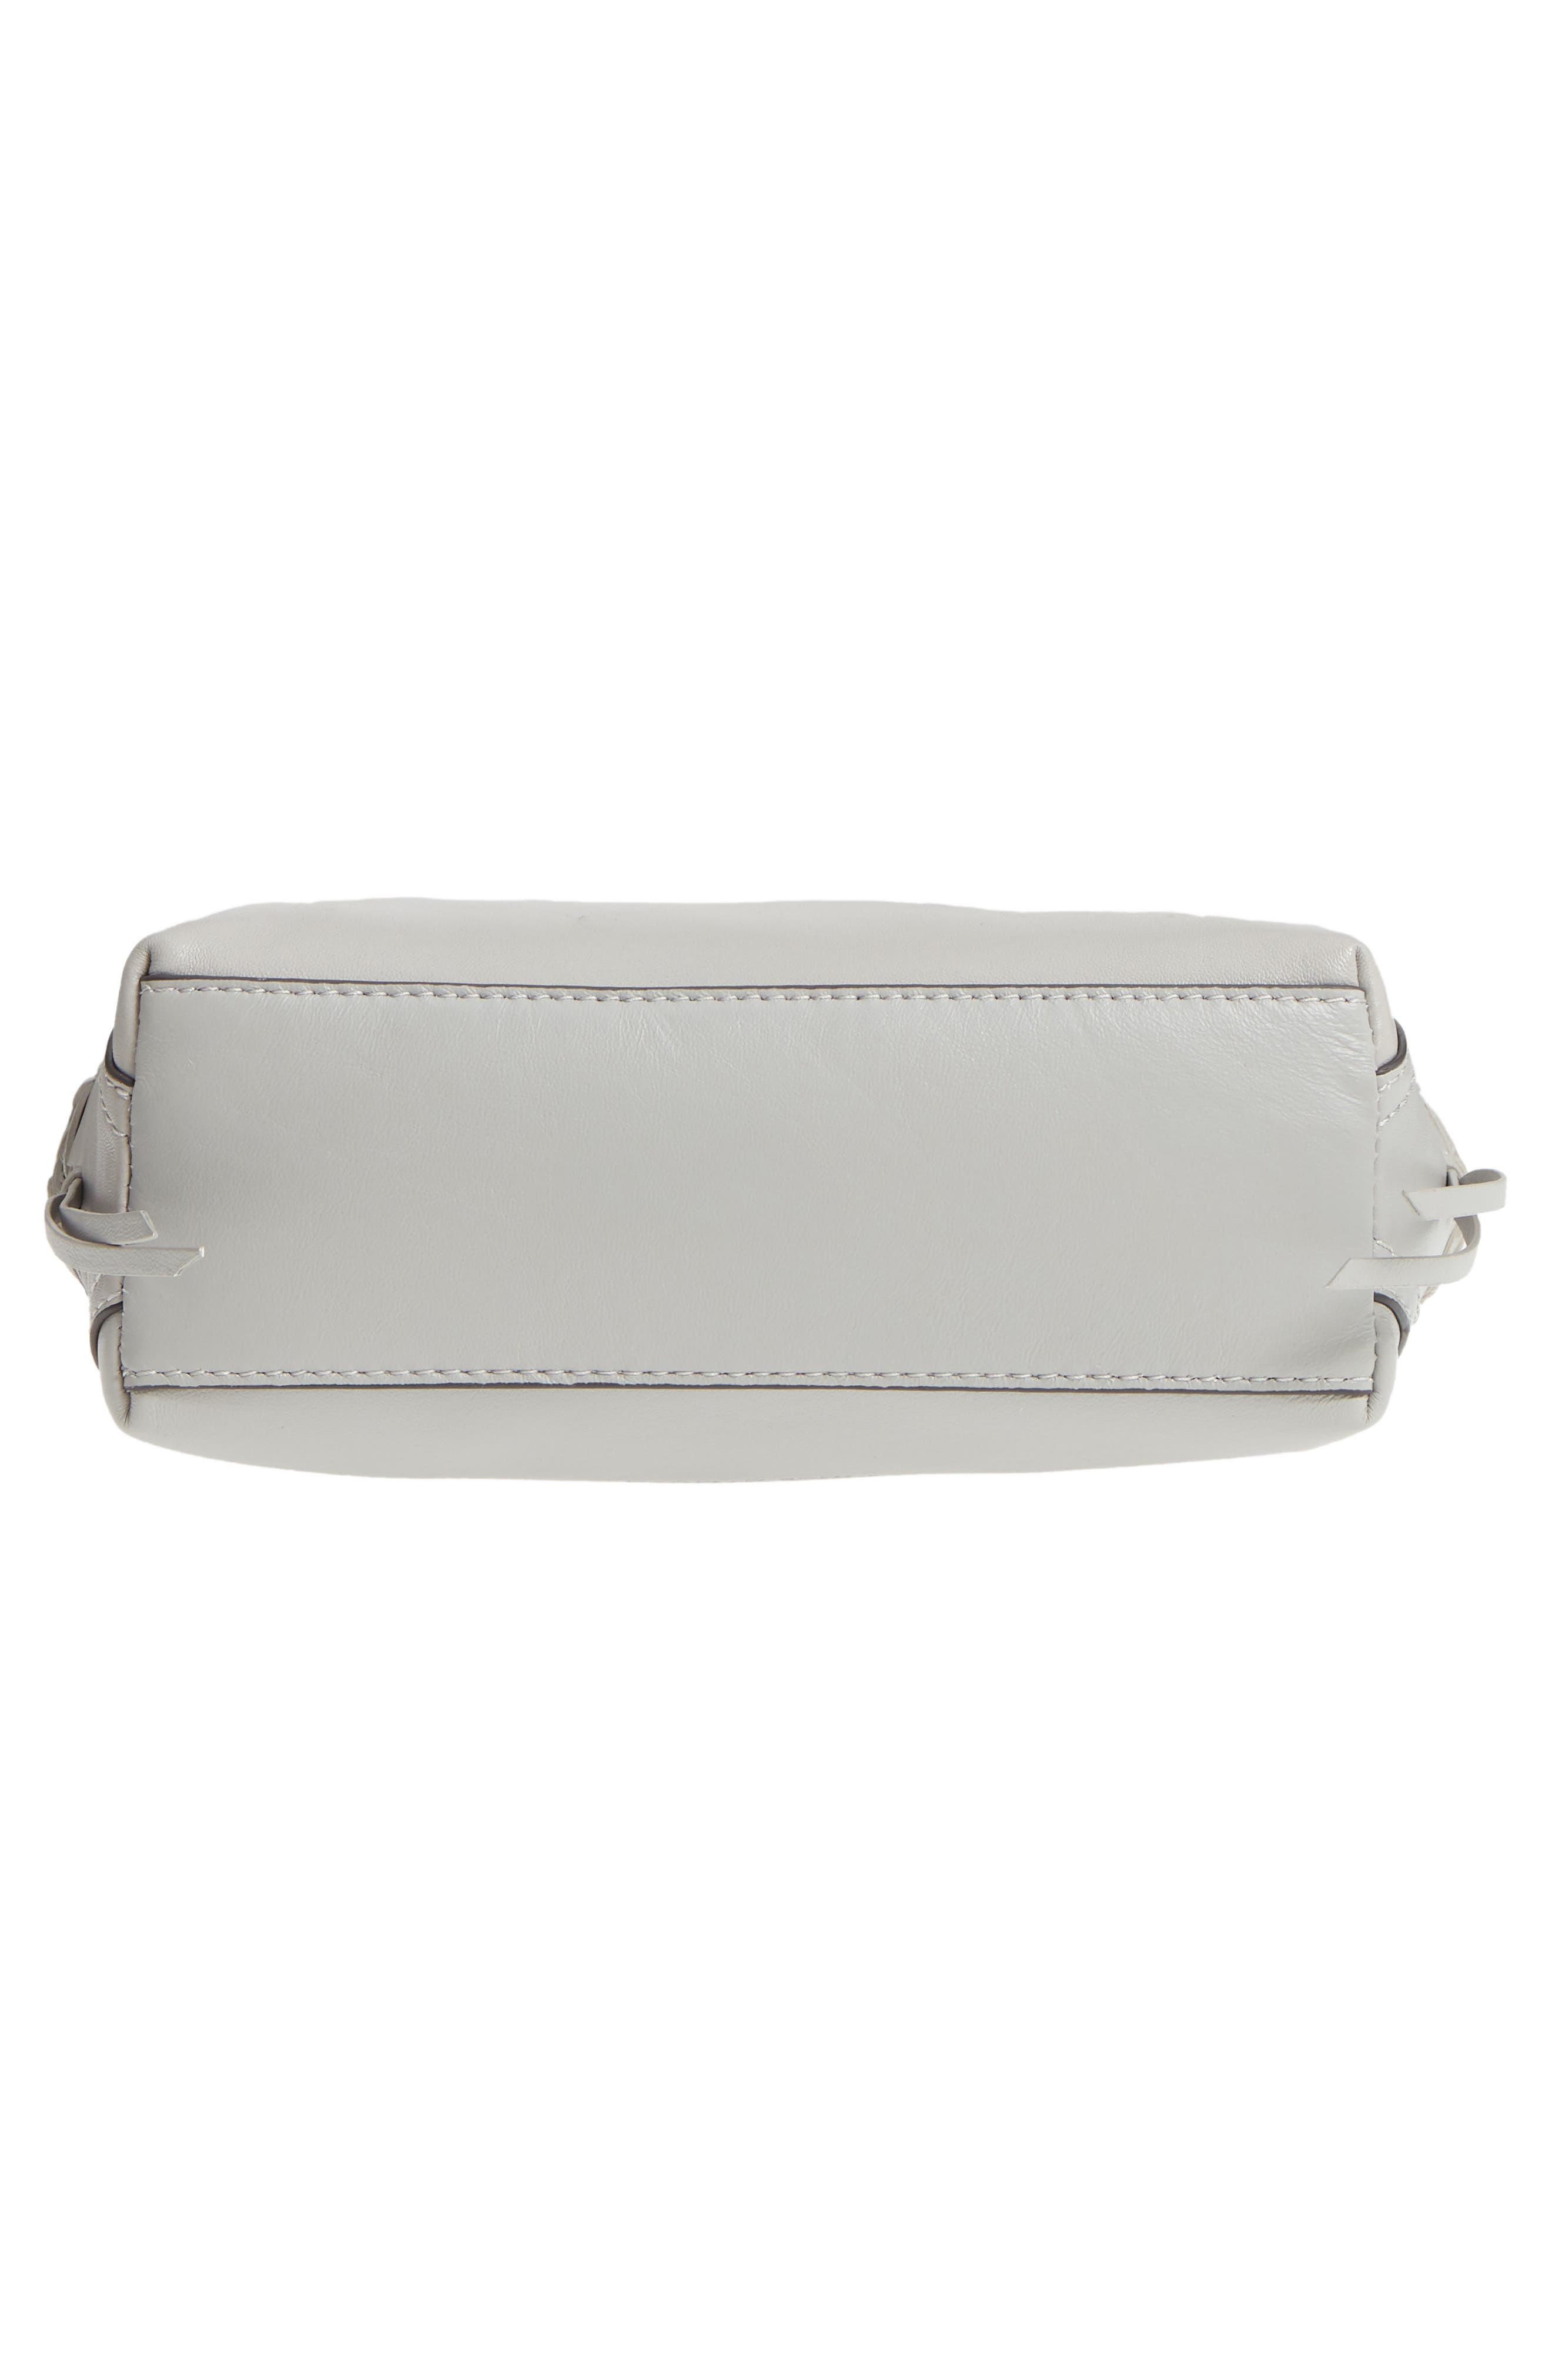 Ilda Leather Crossbody Bag,                             Alternate thumbnail 6, color,                             Full Steam